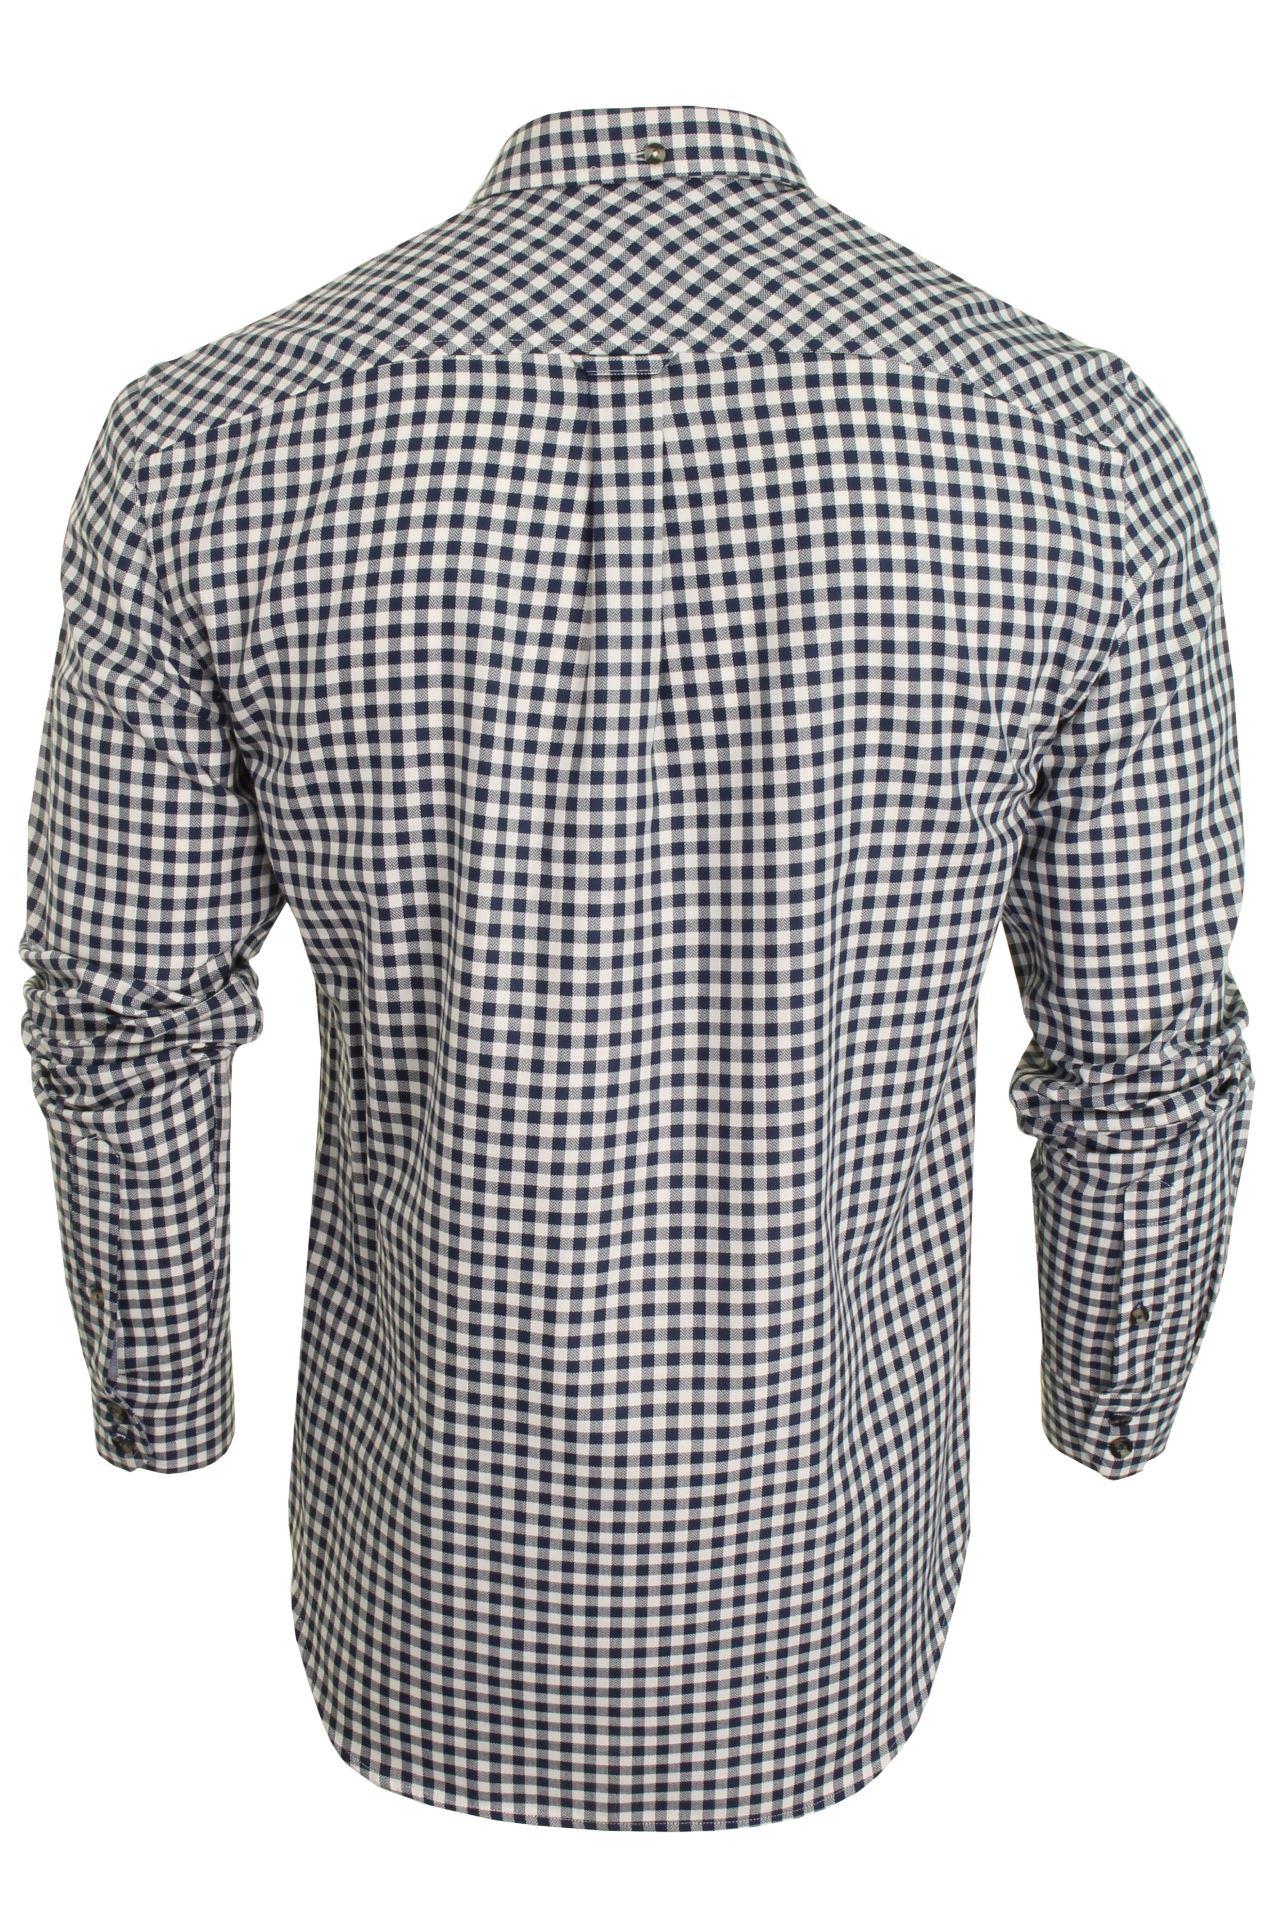 Mens-Ben-Sherman-Long-Sleeved-Shirt-Brushed-Gingham-Check thumbnail 5